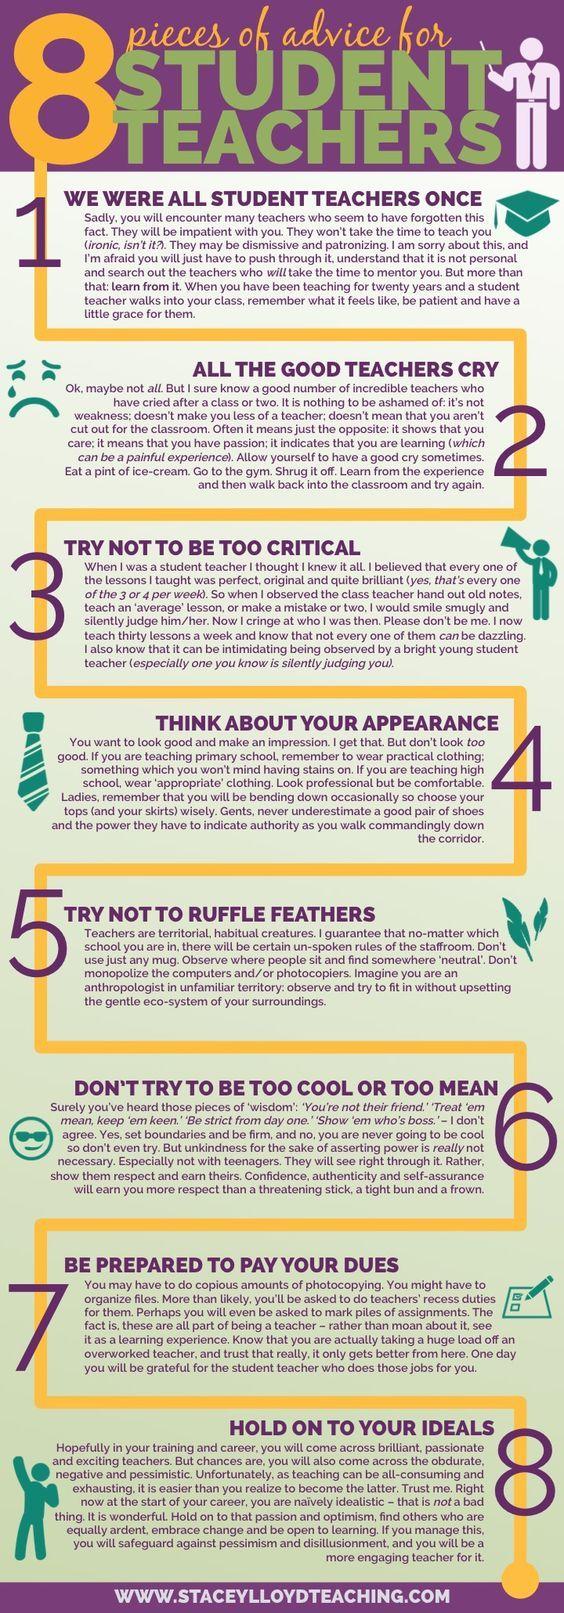 Advice to student teachers